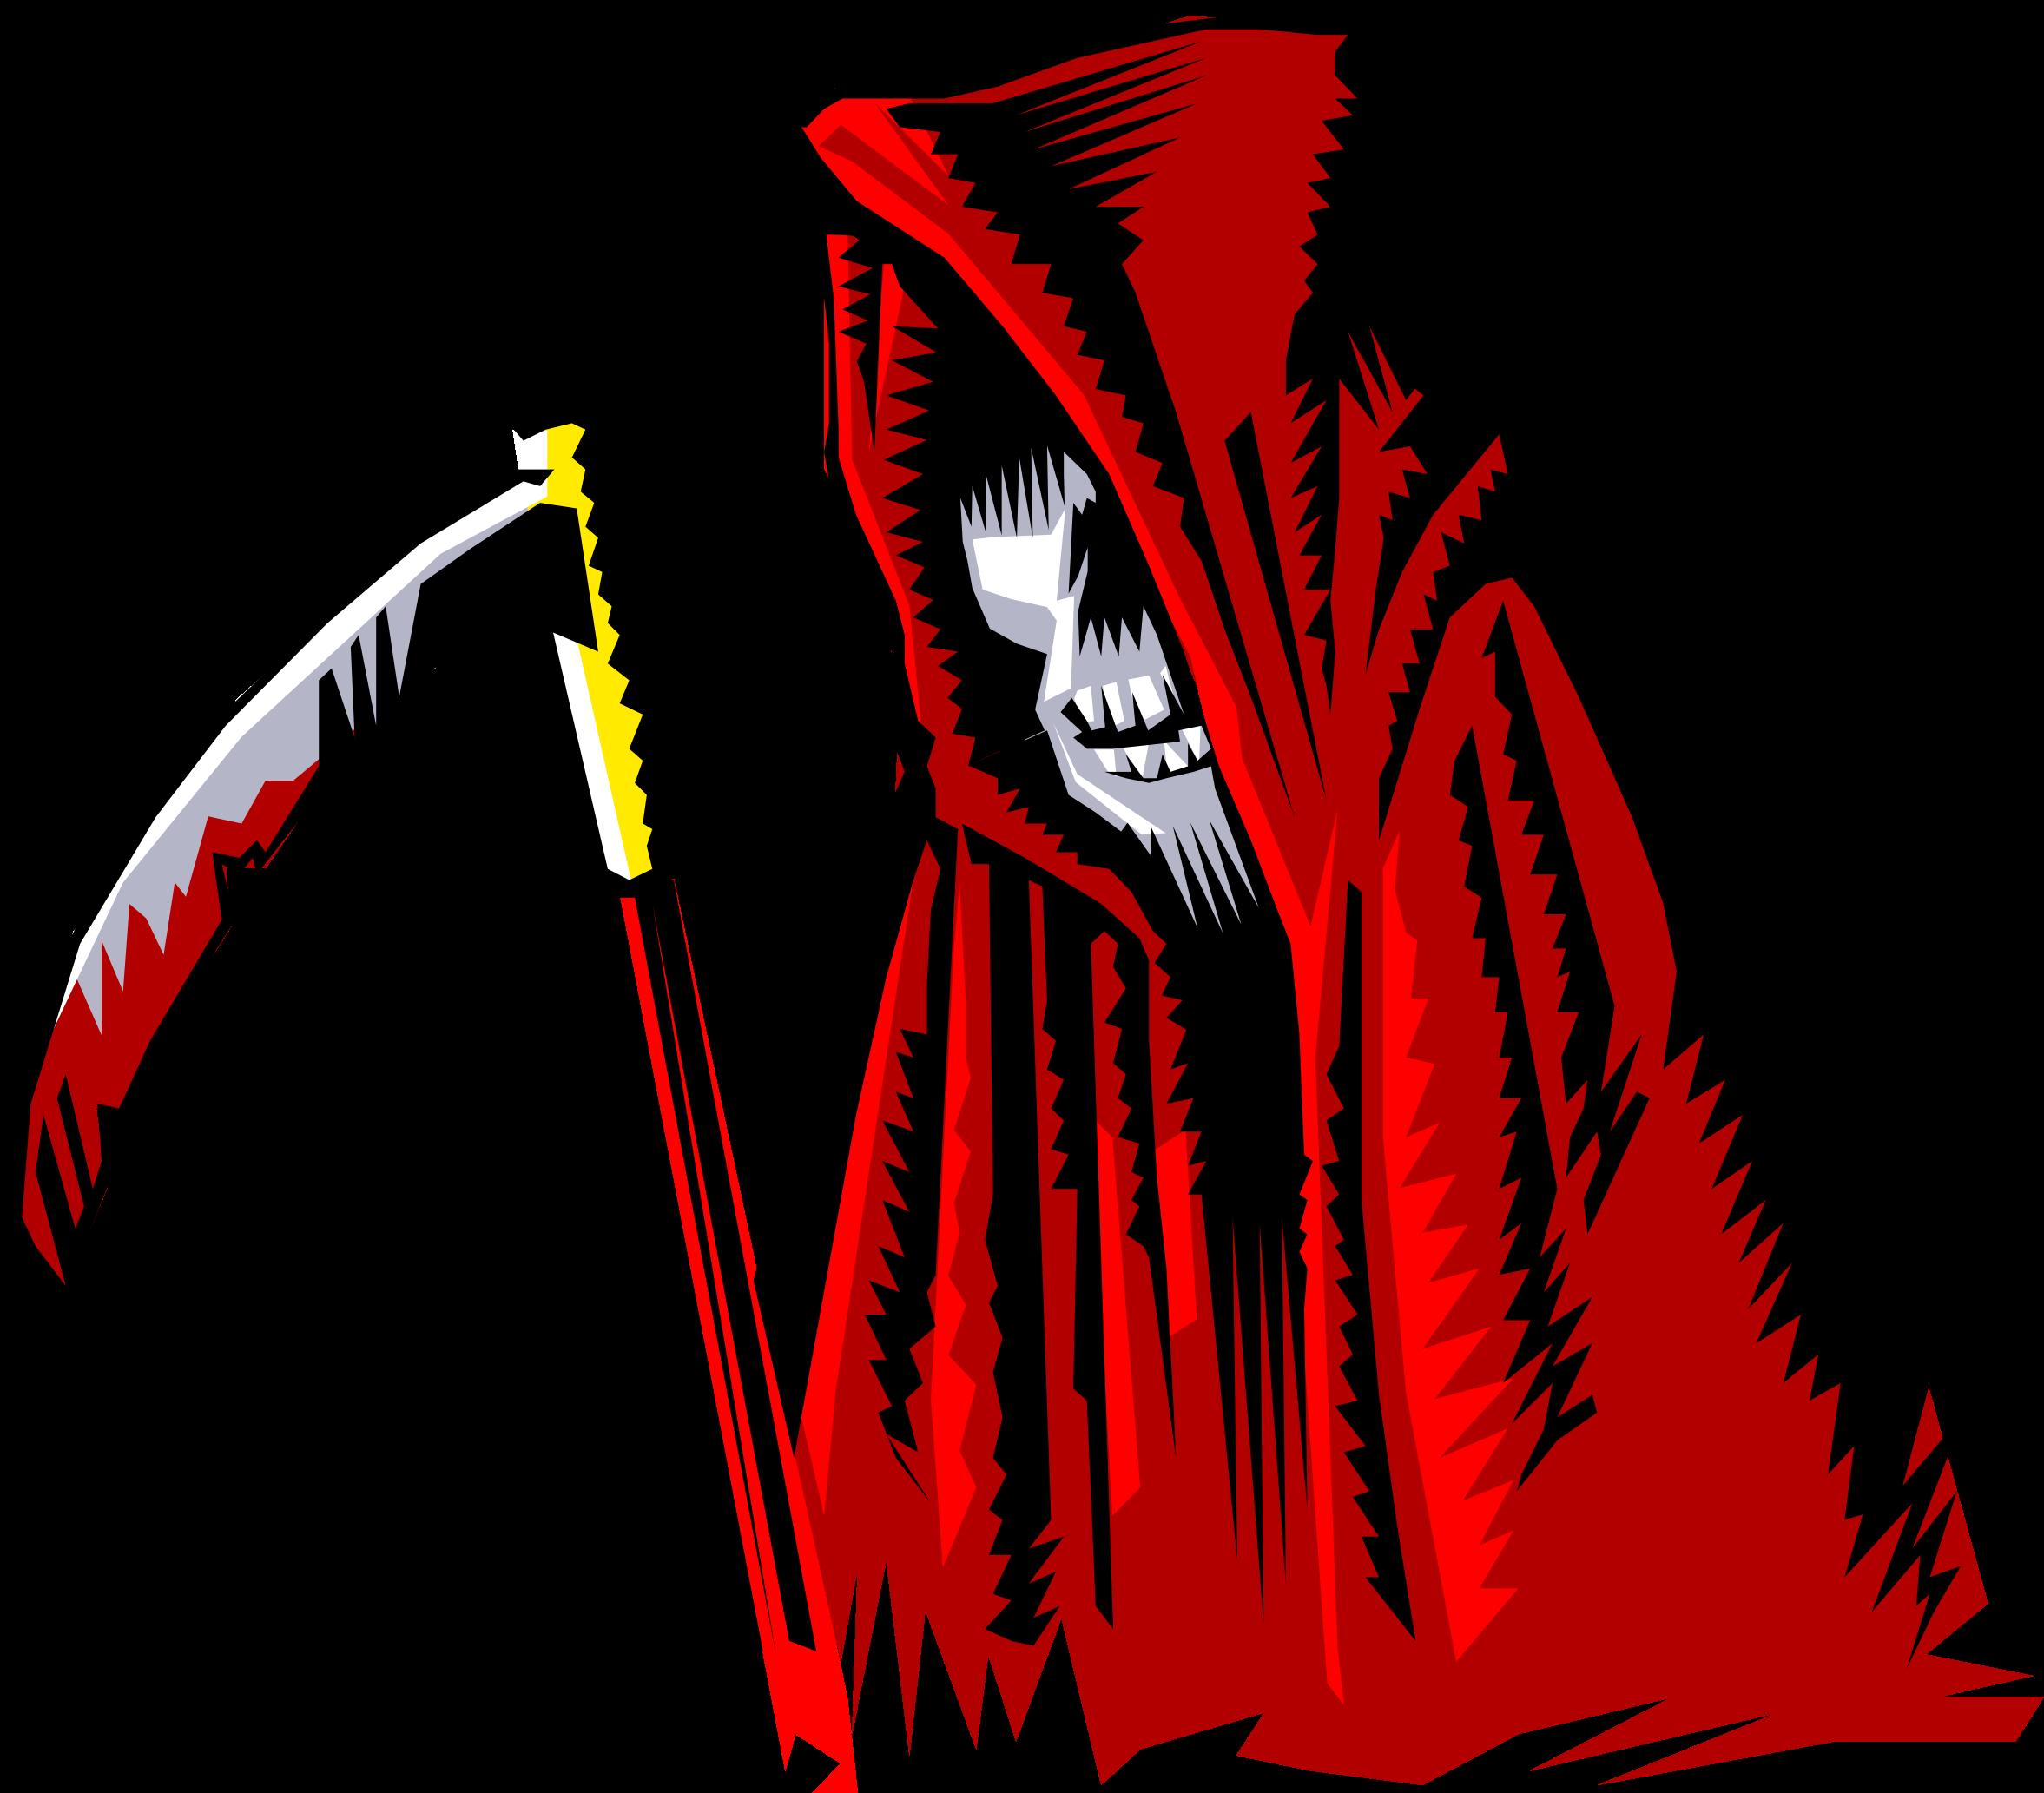 Grim reaper clipart svg, Grim reaper svg Transparent FREE ...